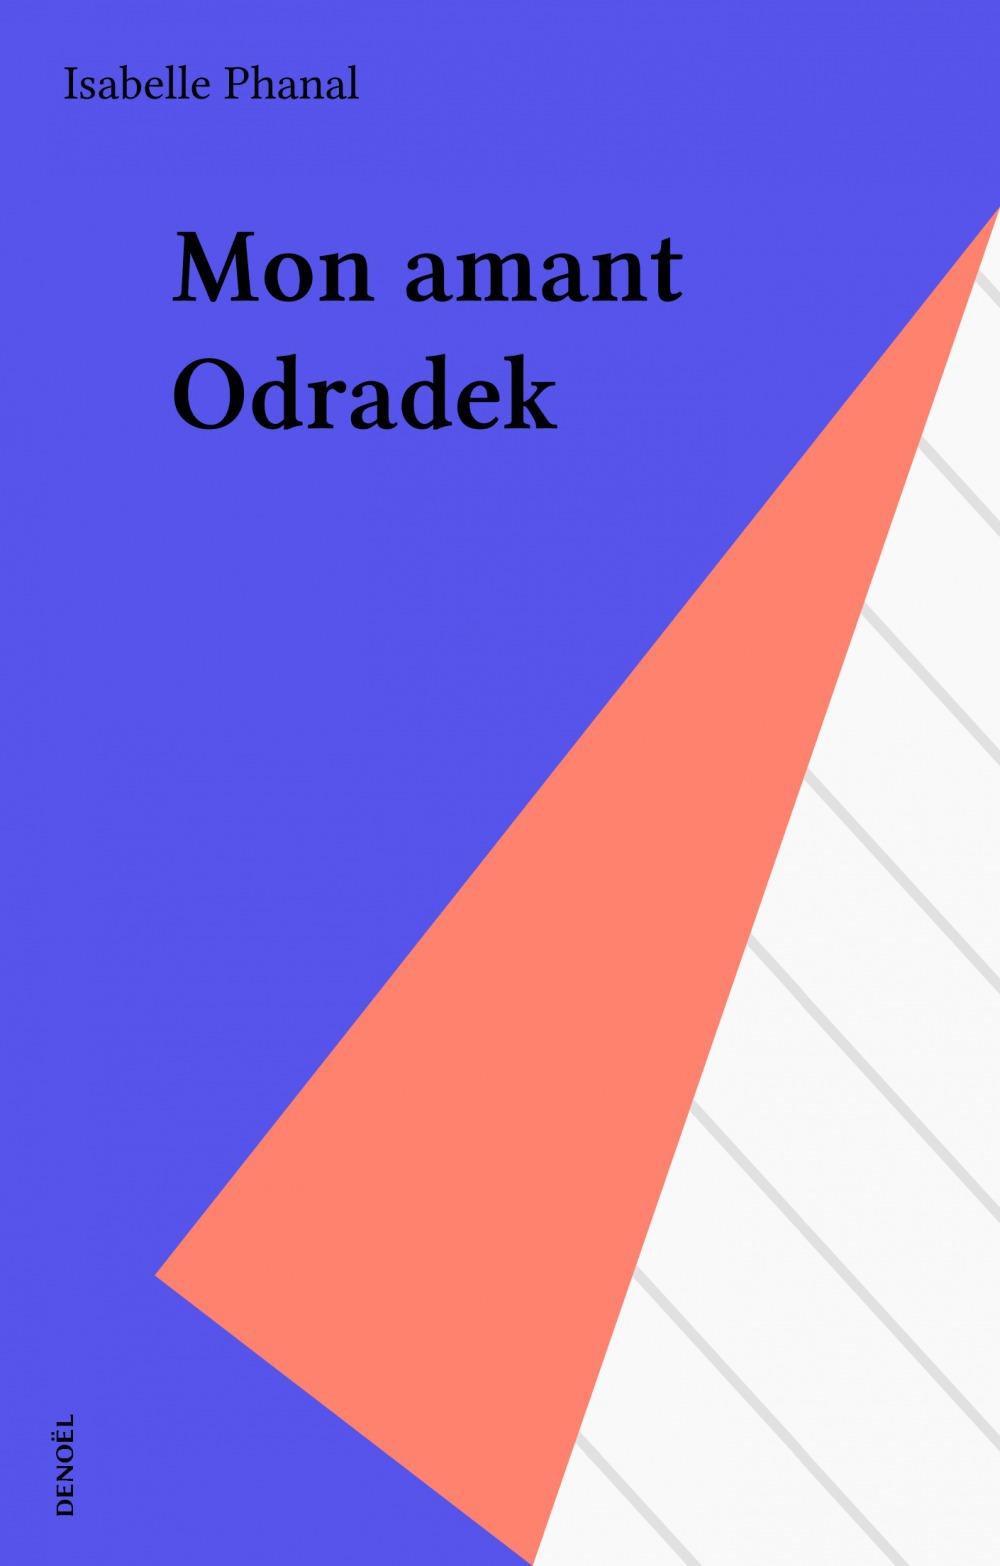 Mon amant Odradek